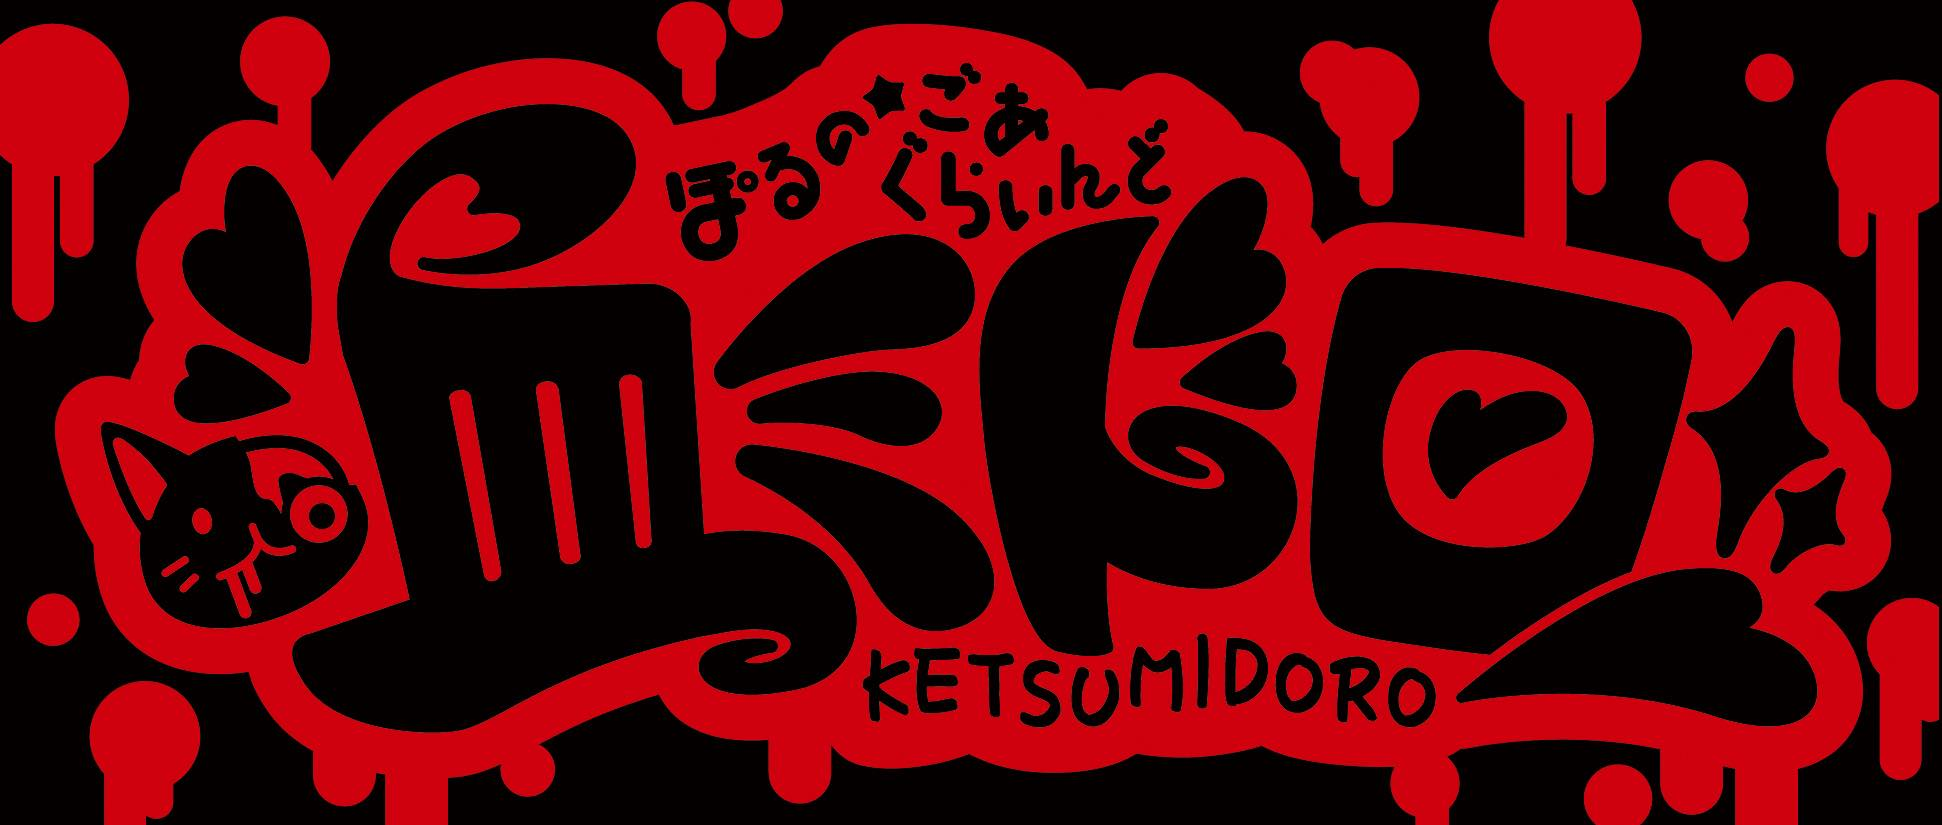 Ketsumidoro(血ミドロ)